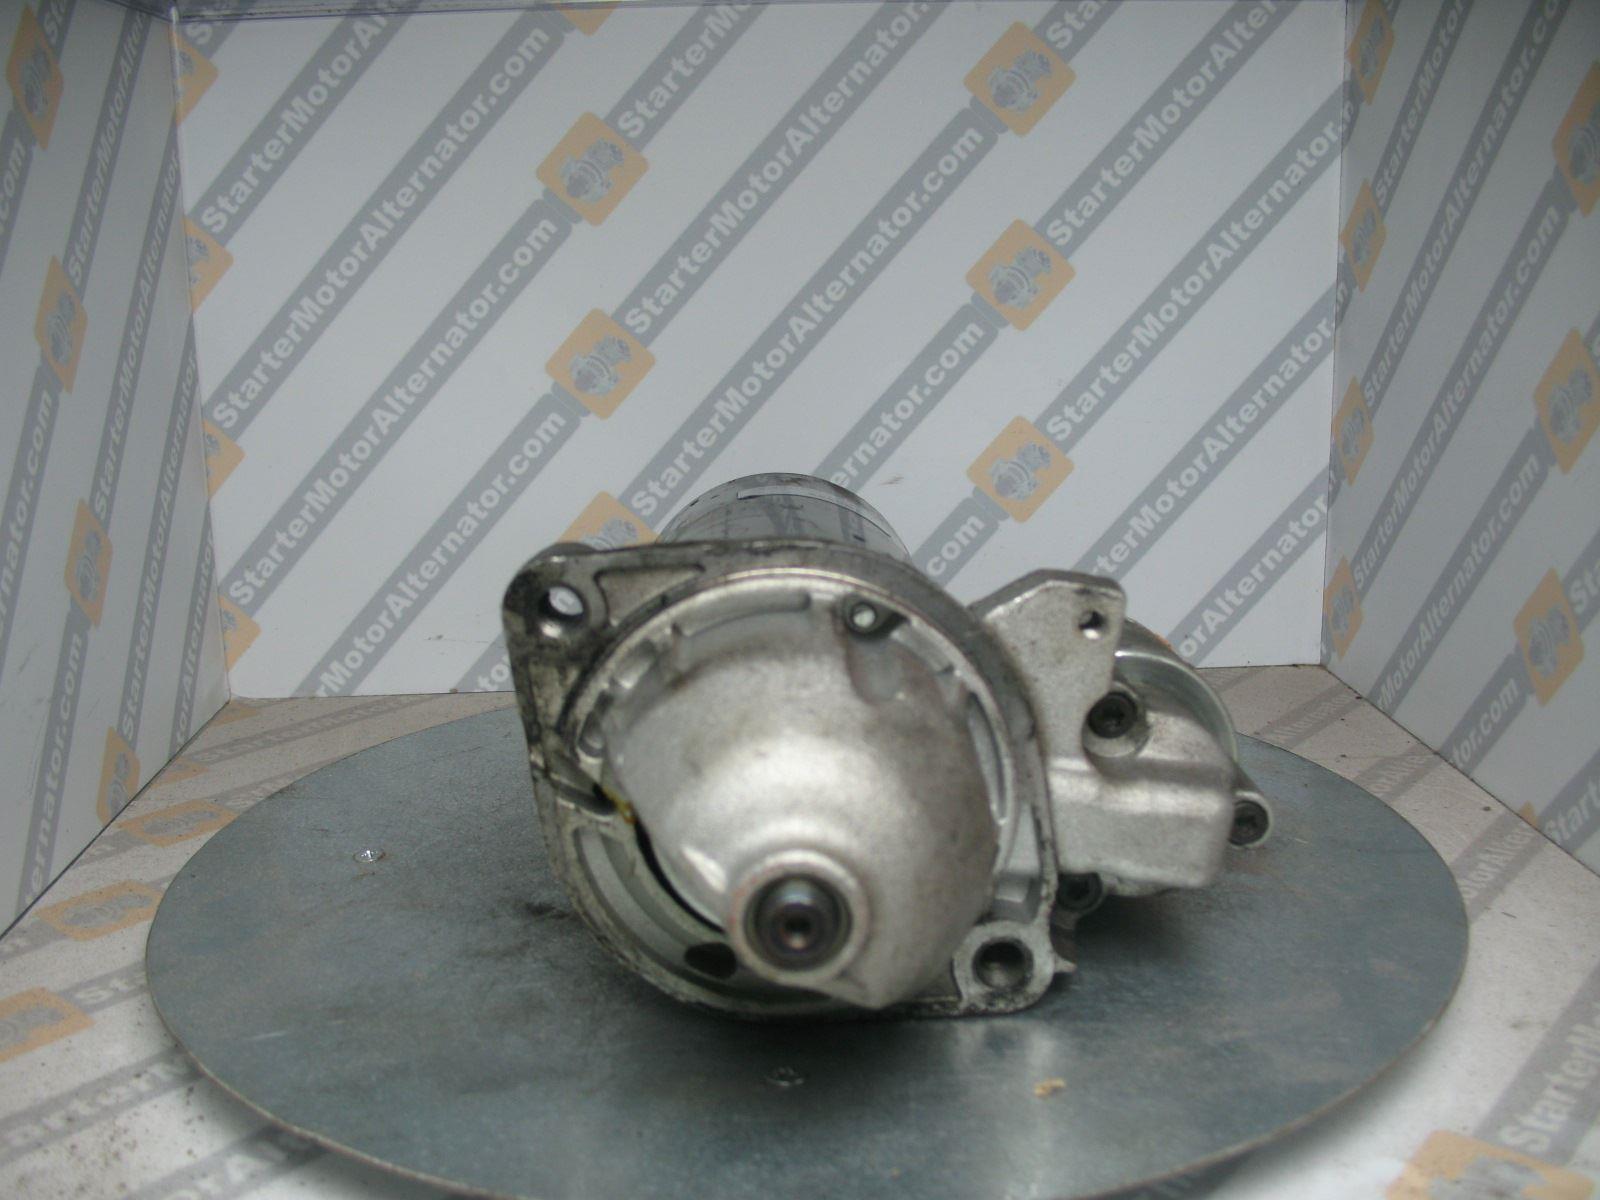 XIS1234 Starter Motor For Mercedes Benz / Mercedes Bus/Truck